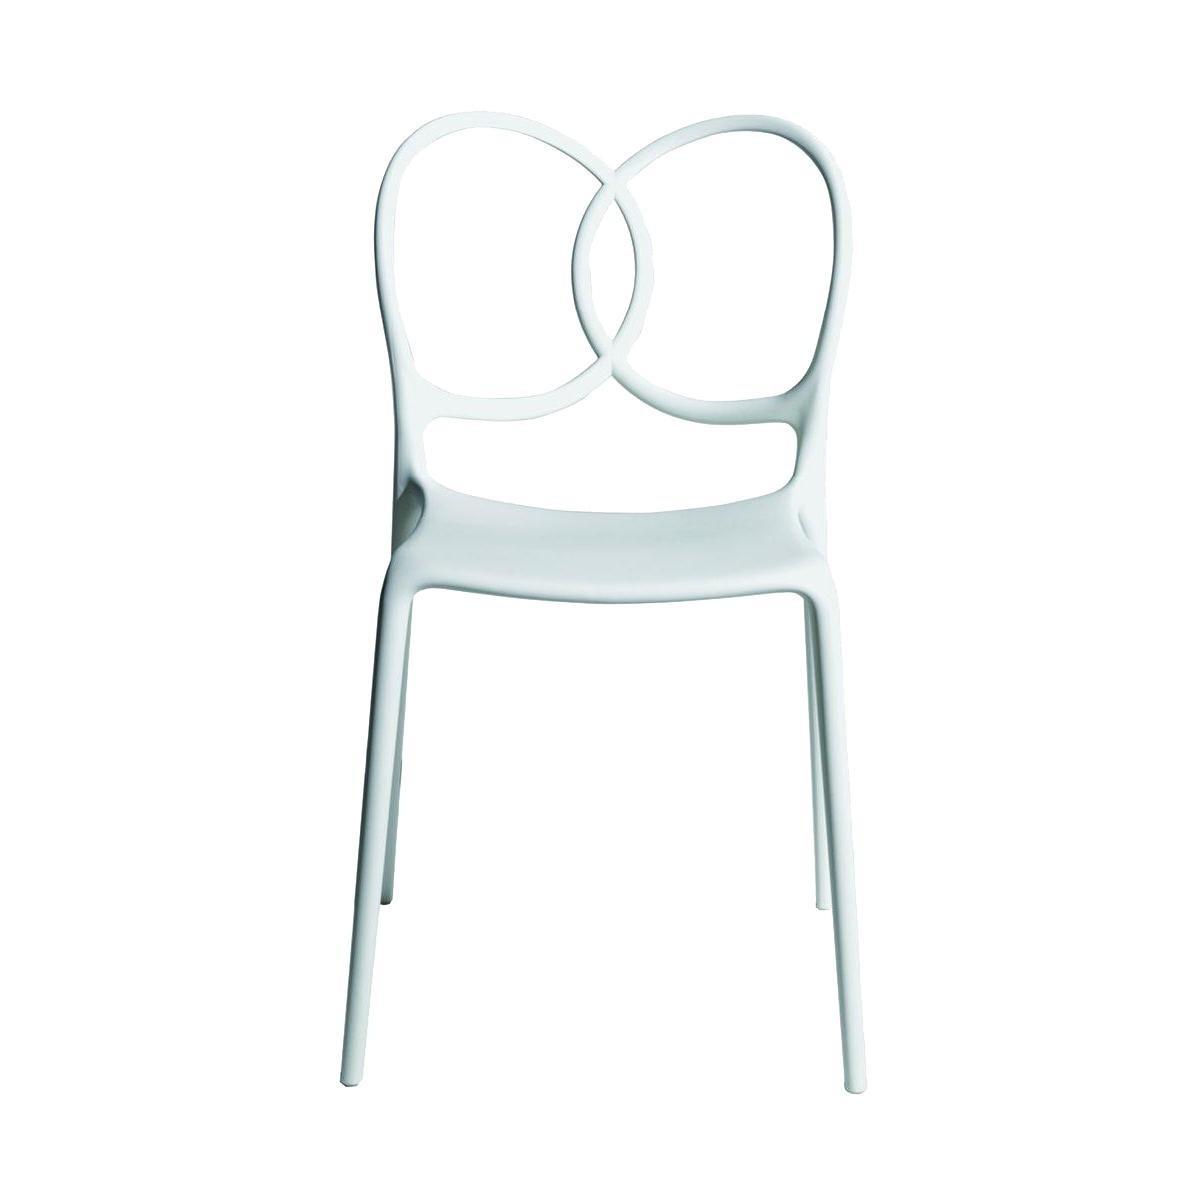 driade sissi chair ambientedirect rh ambientedirect com